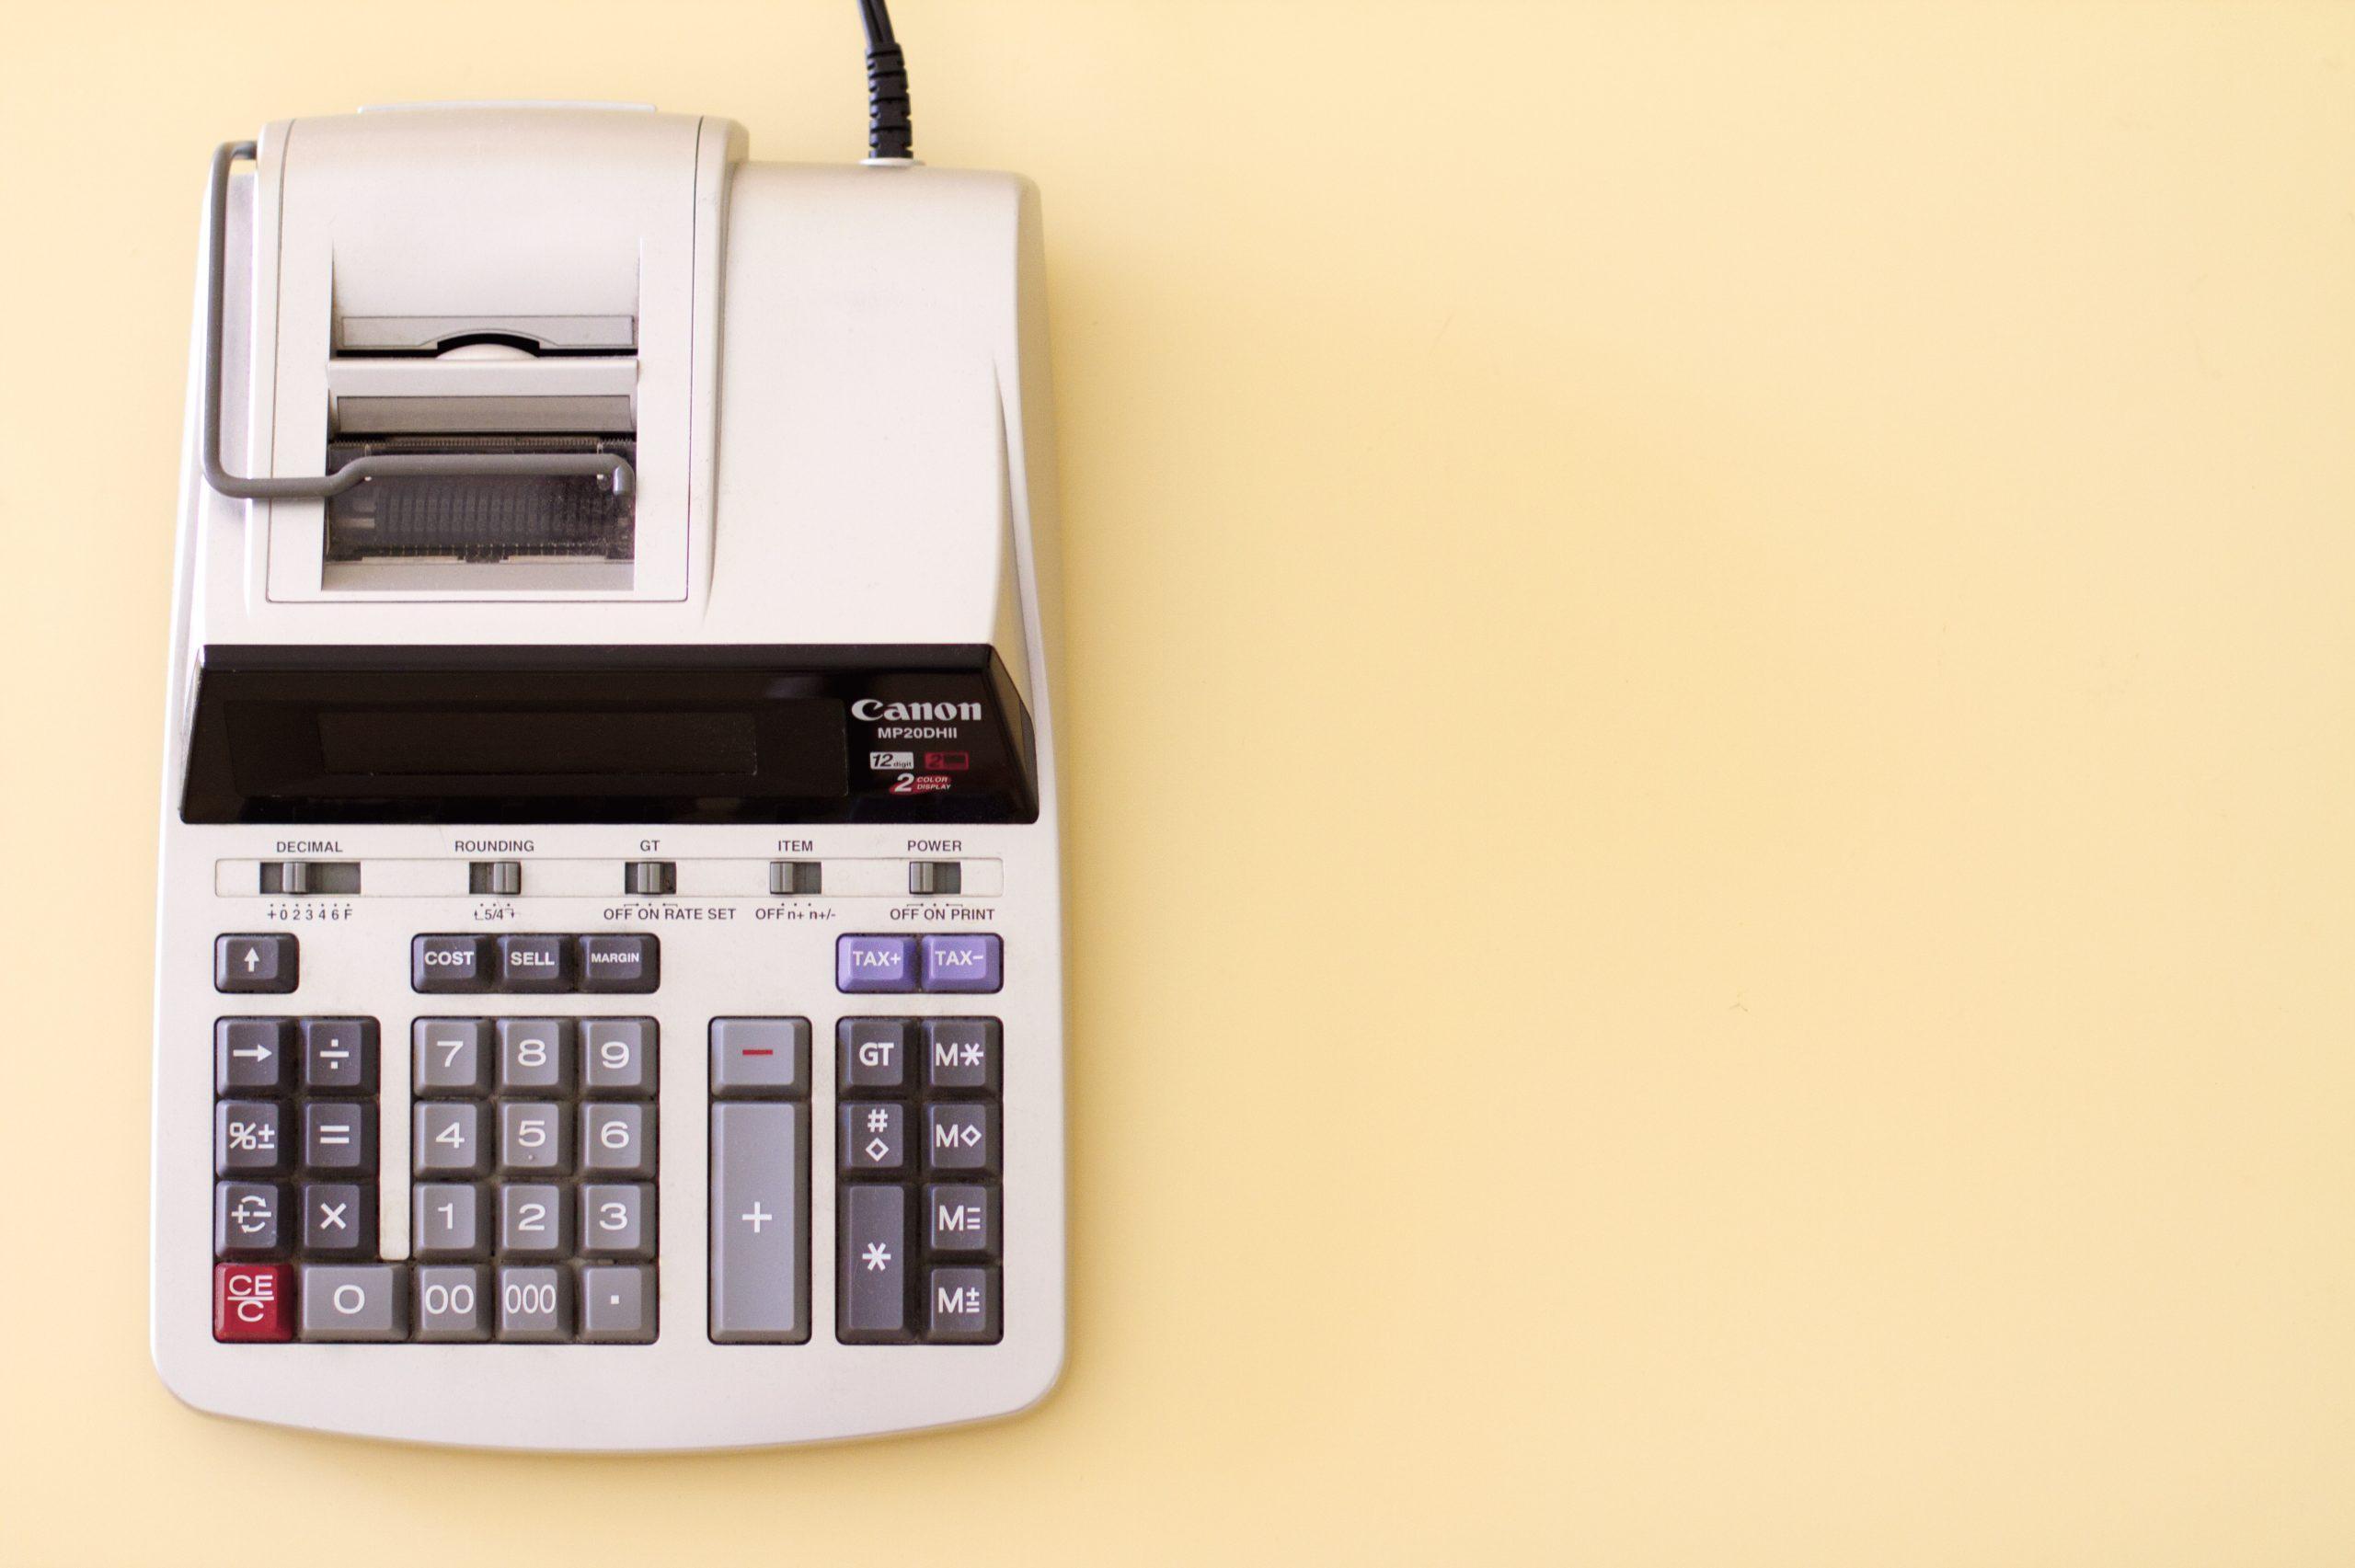 Newbuy Mortgage Calculator